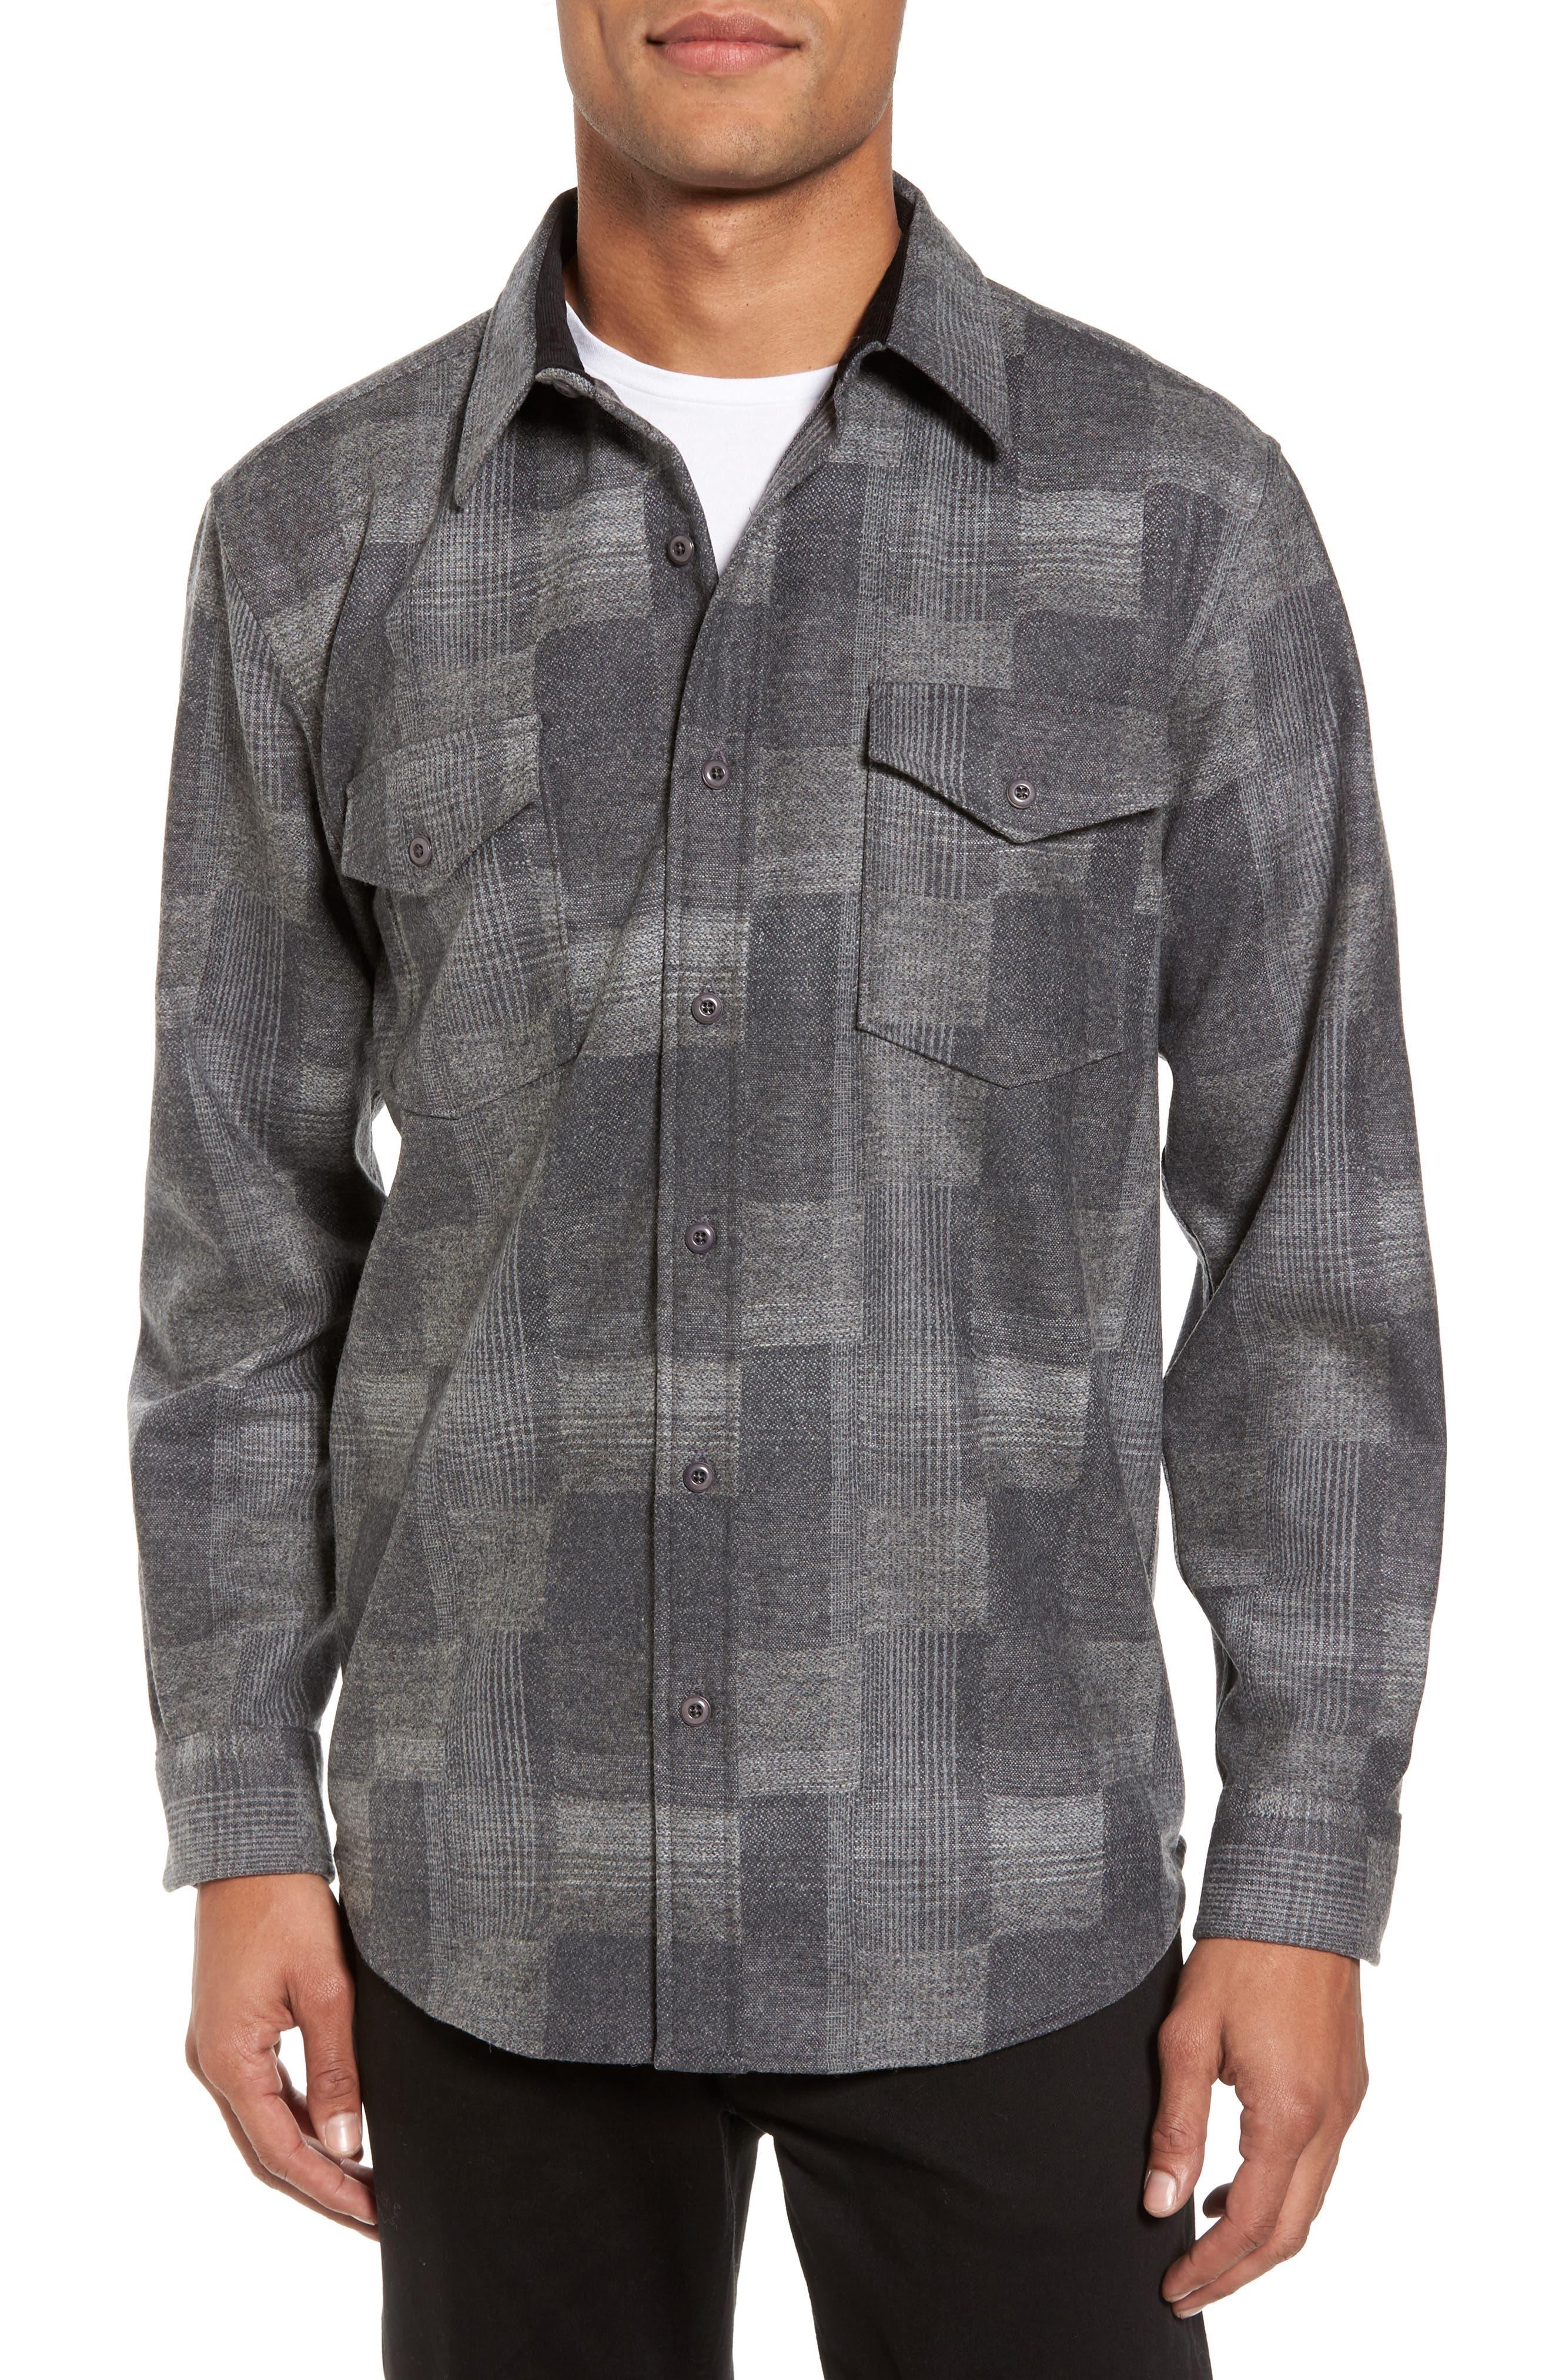 Alternate Image 1 Selected - Pendleton Boro Wool Shirt